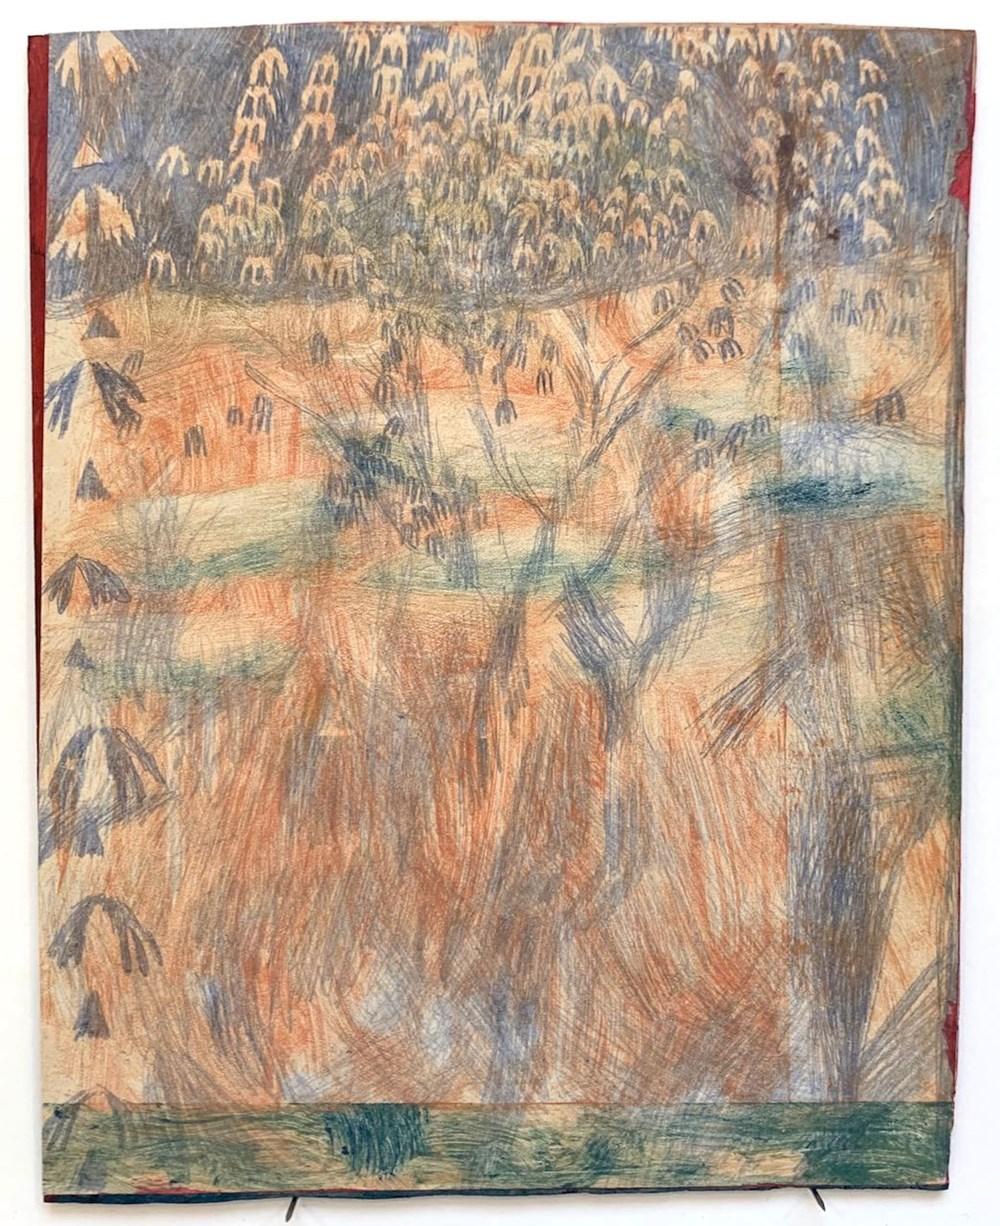 Life on Venus | The Landscape, Live Auction - Lot 3, Georgia Grinter, Carbon Covered World I